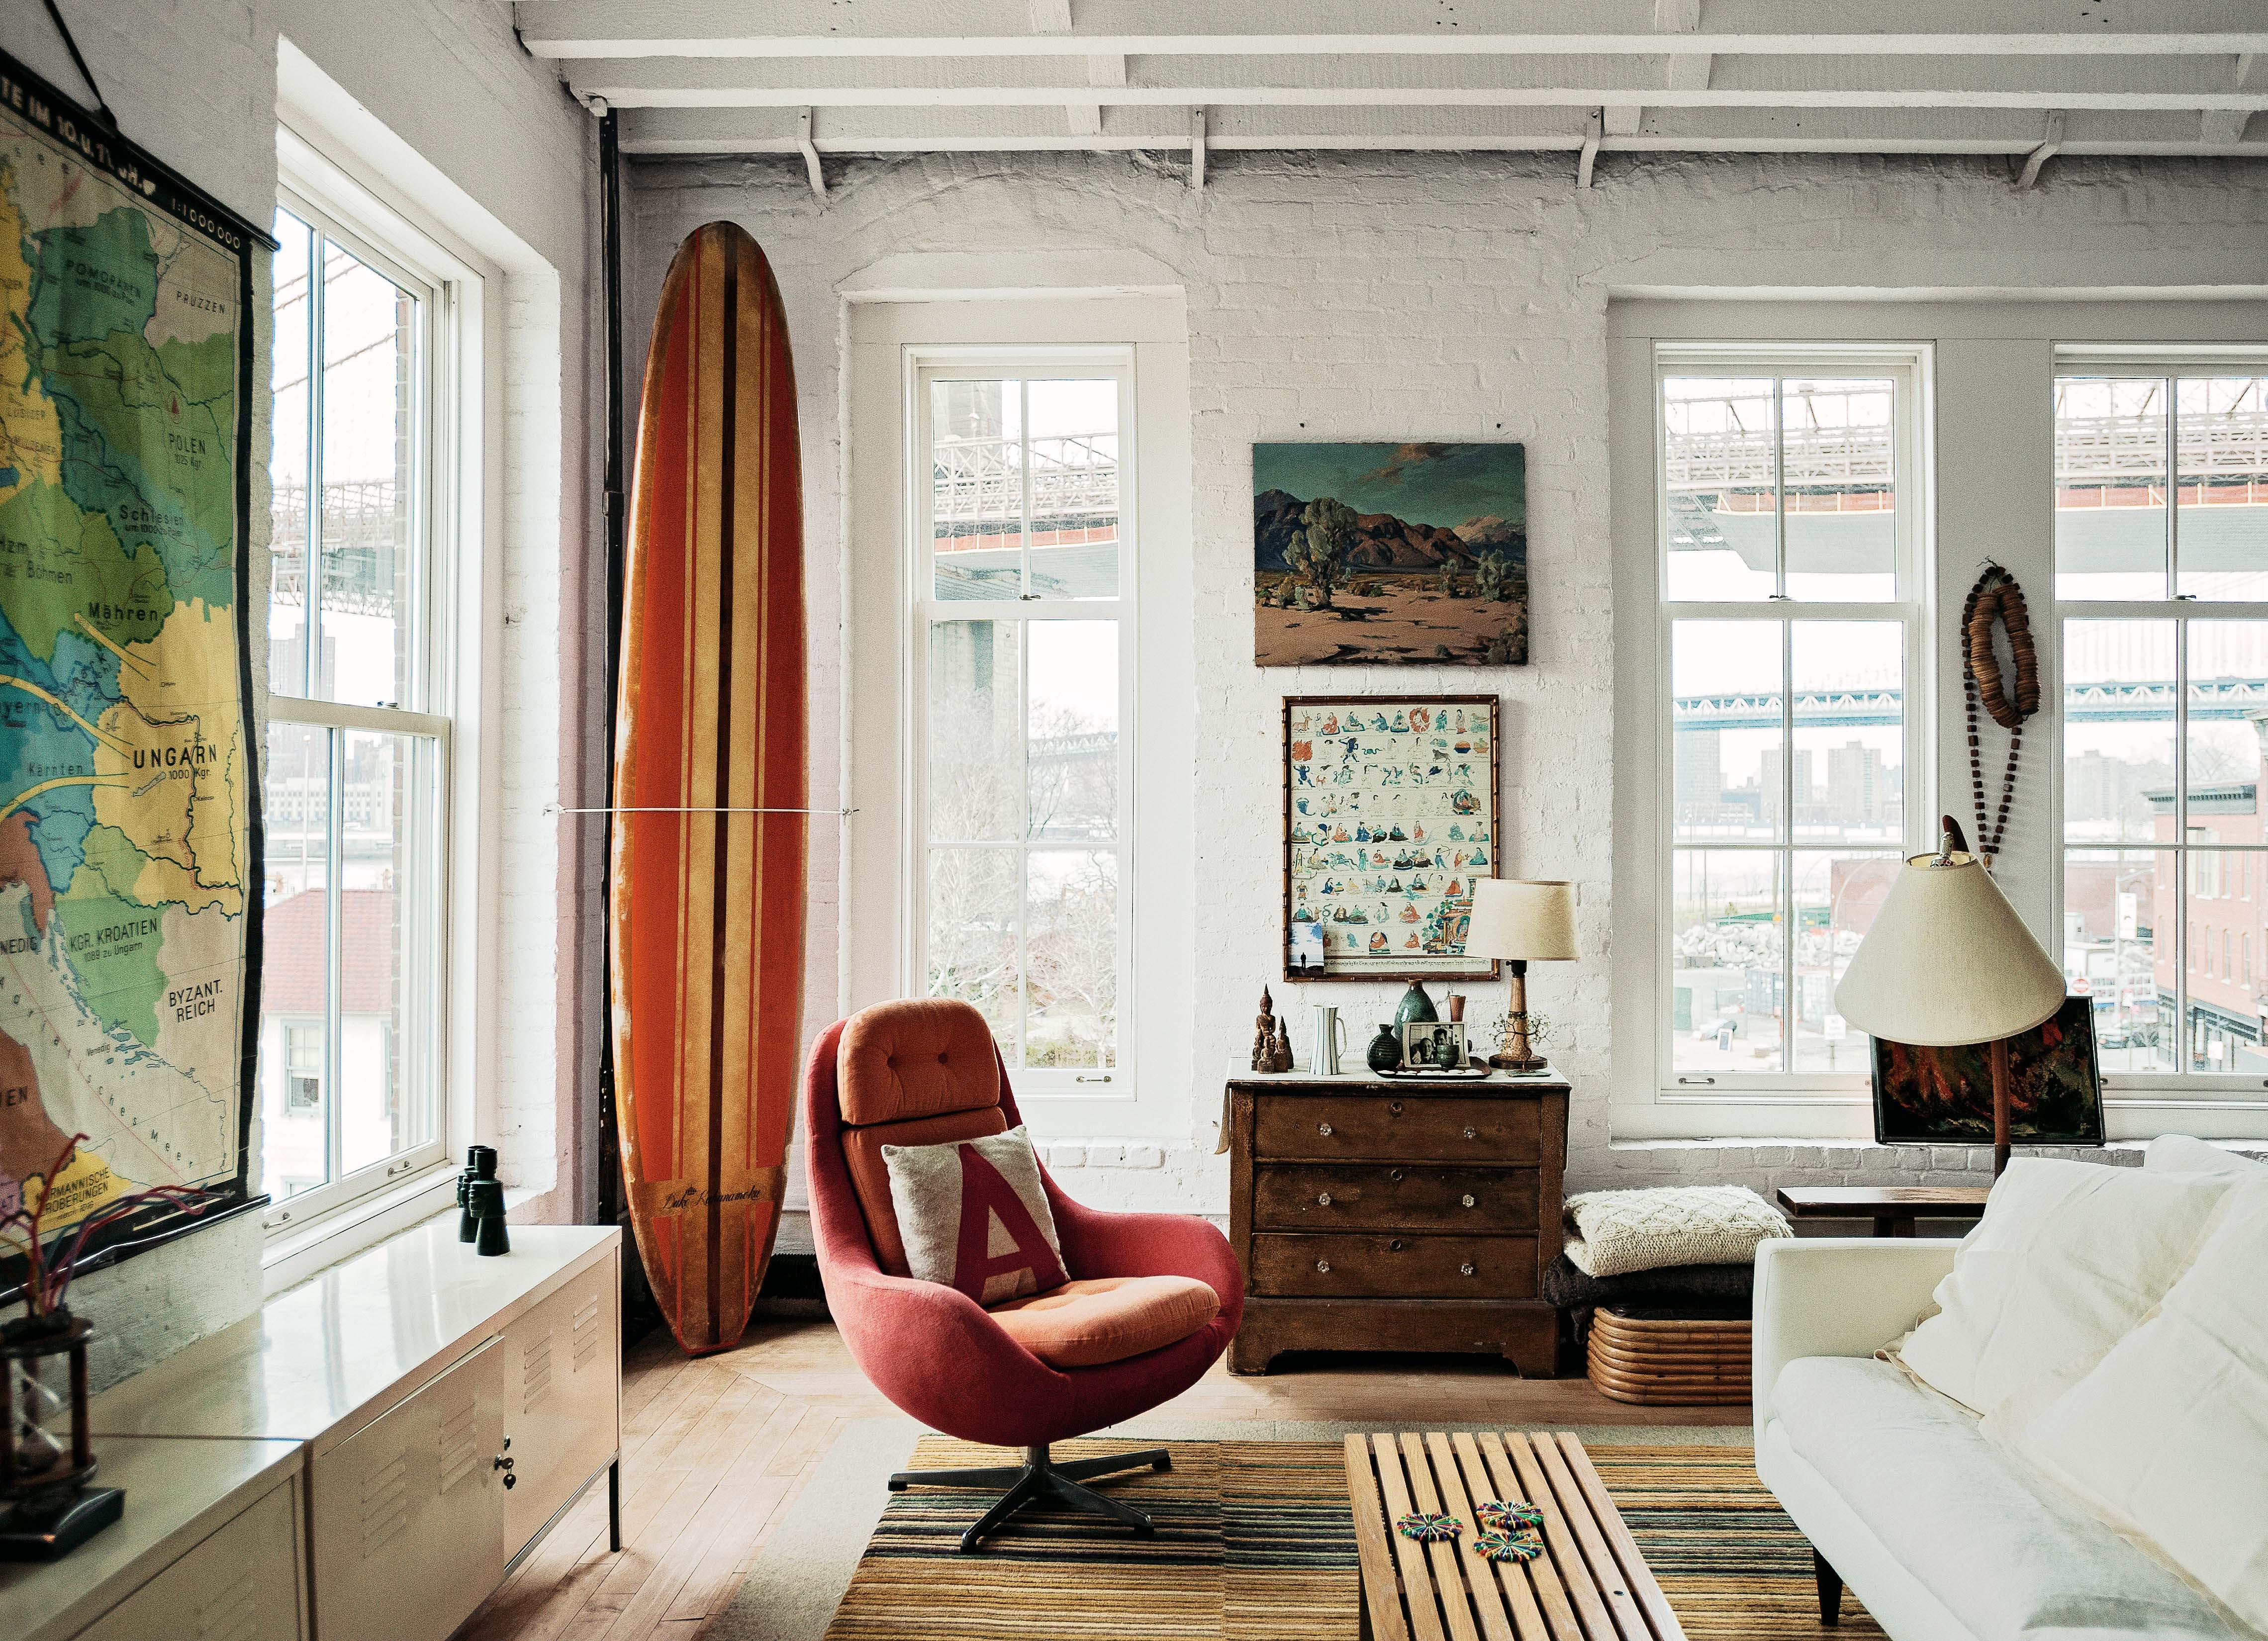 brooklyn interior wohnen am coolsten ort der welt knesebeck verlag. Black Bedroom Furniture Sets. Home Design Ideas